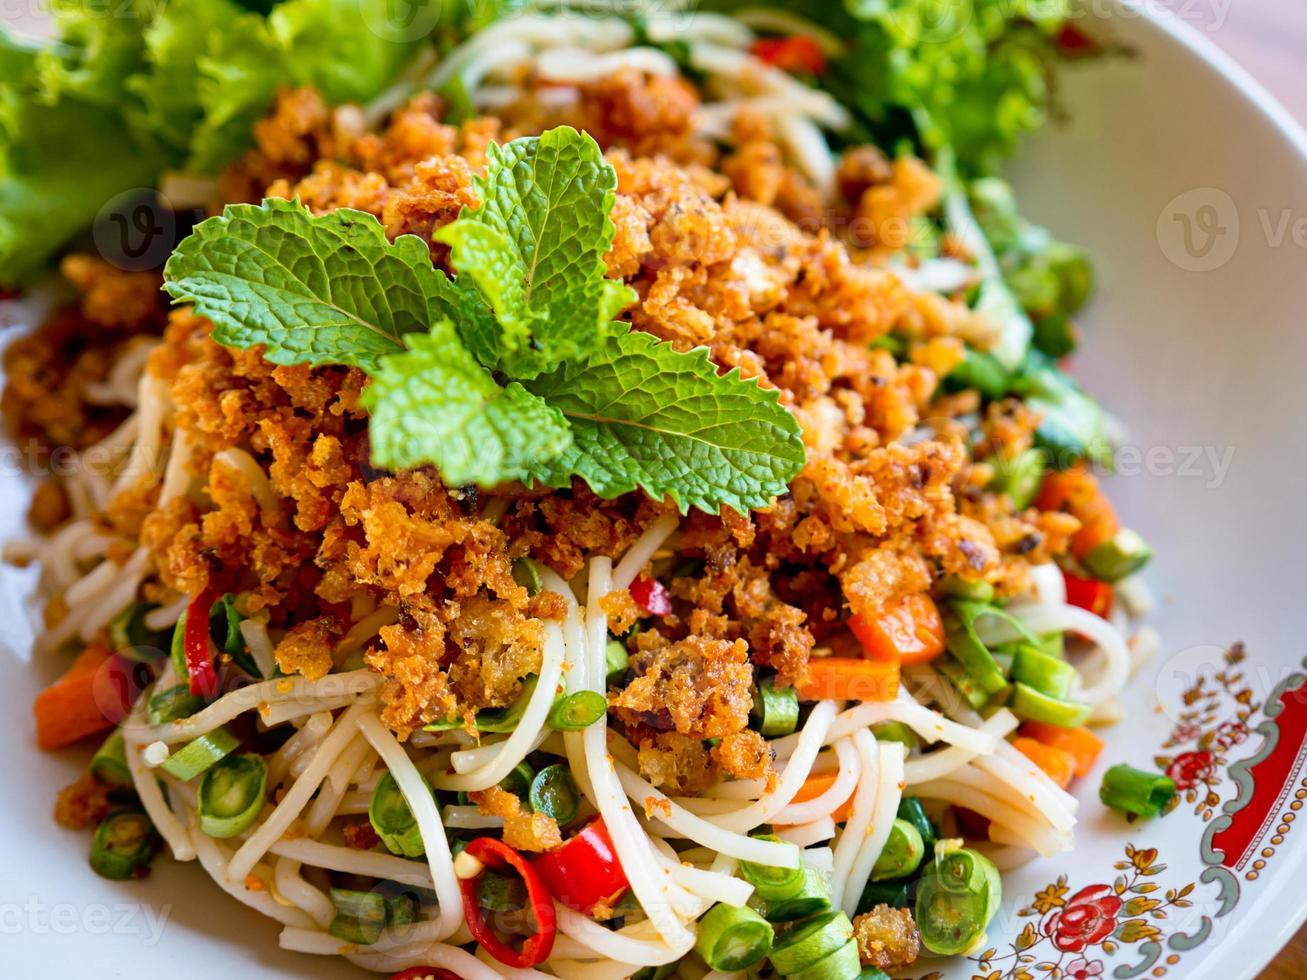 kryddig ris vermicelli sallad foto